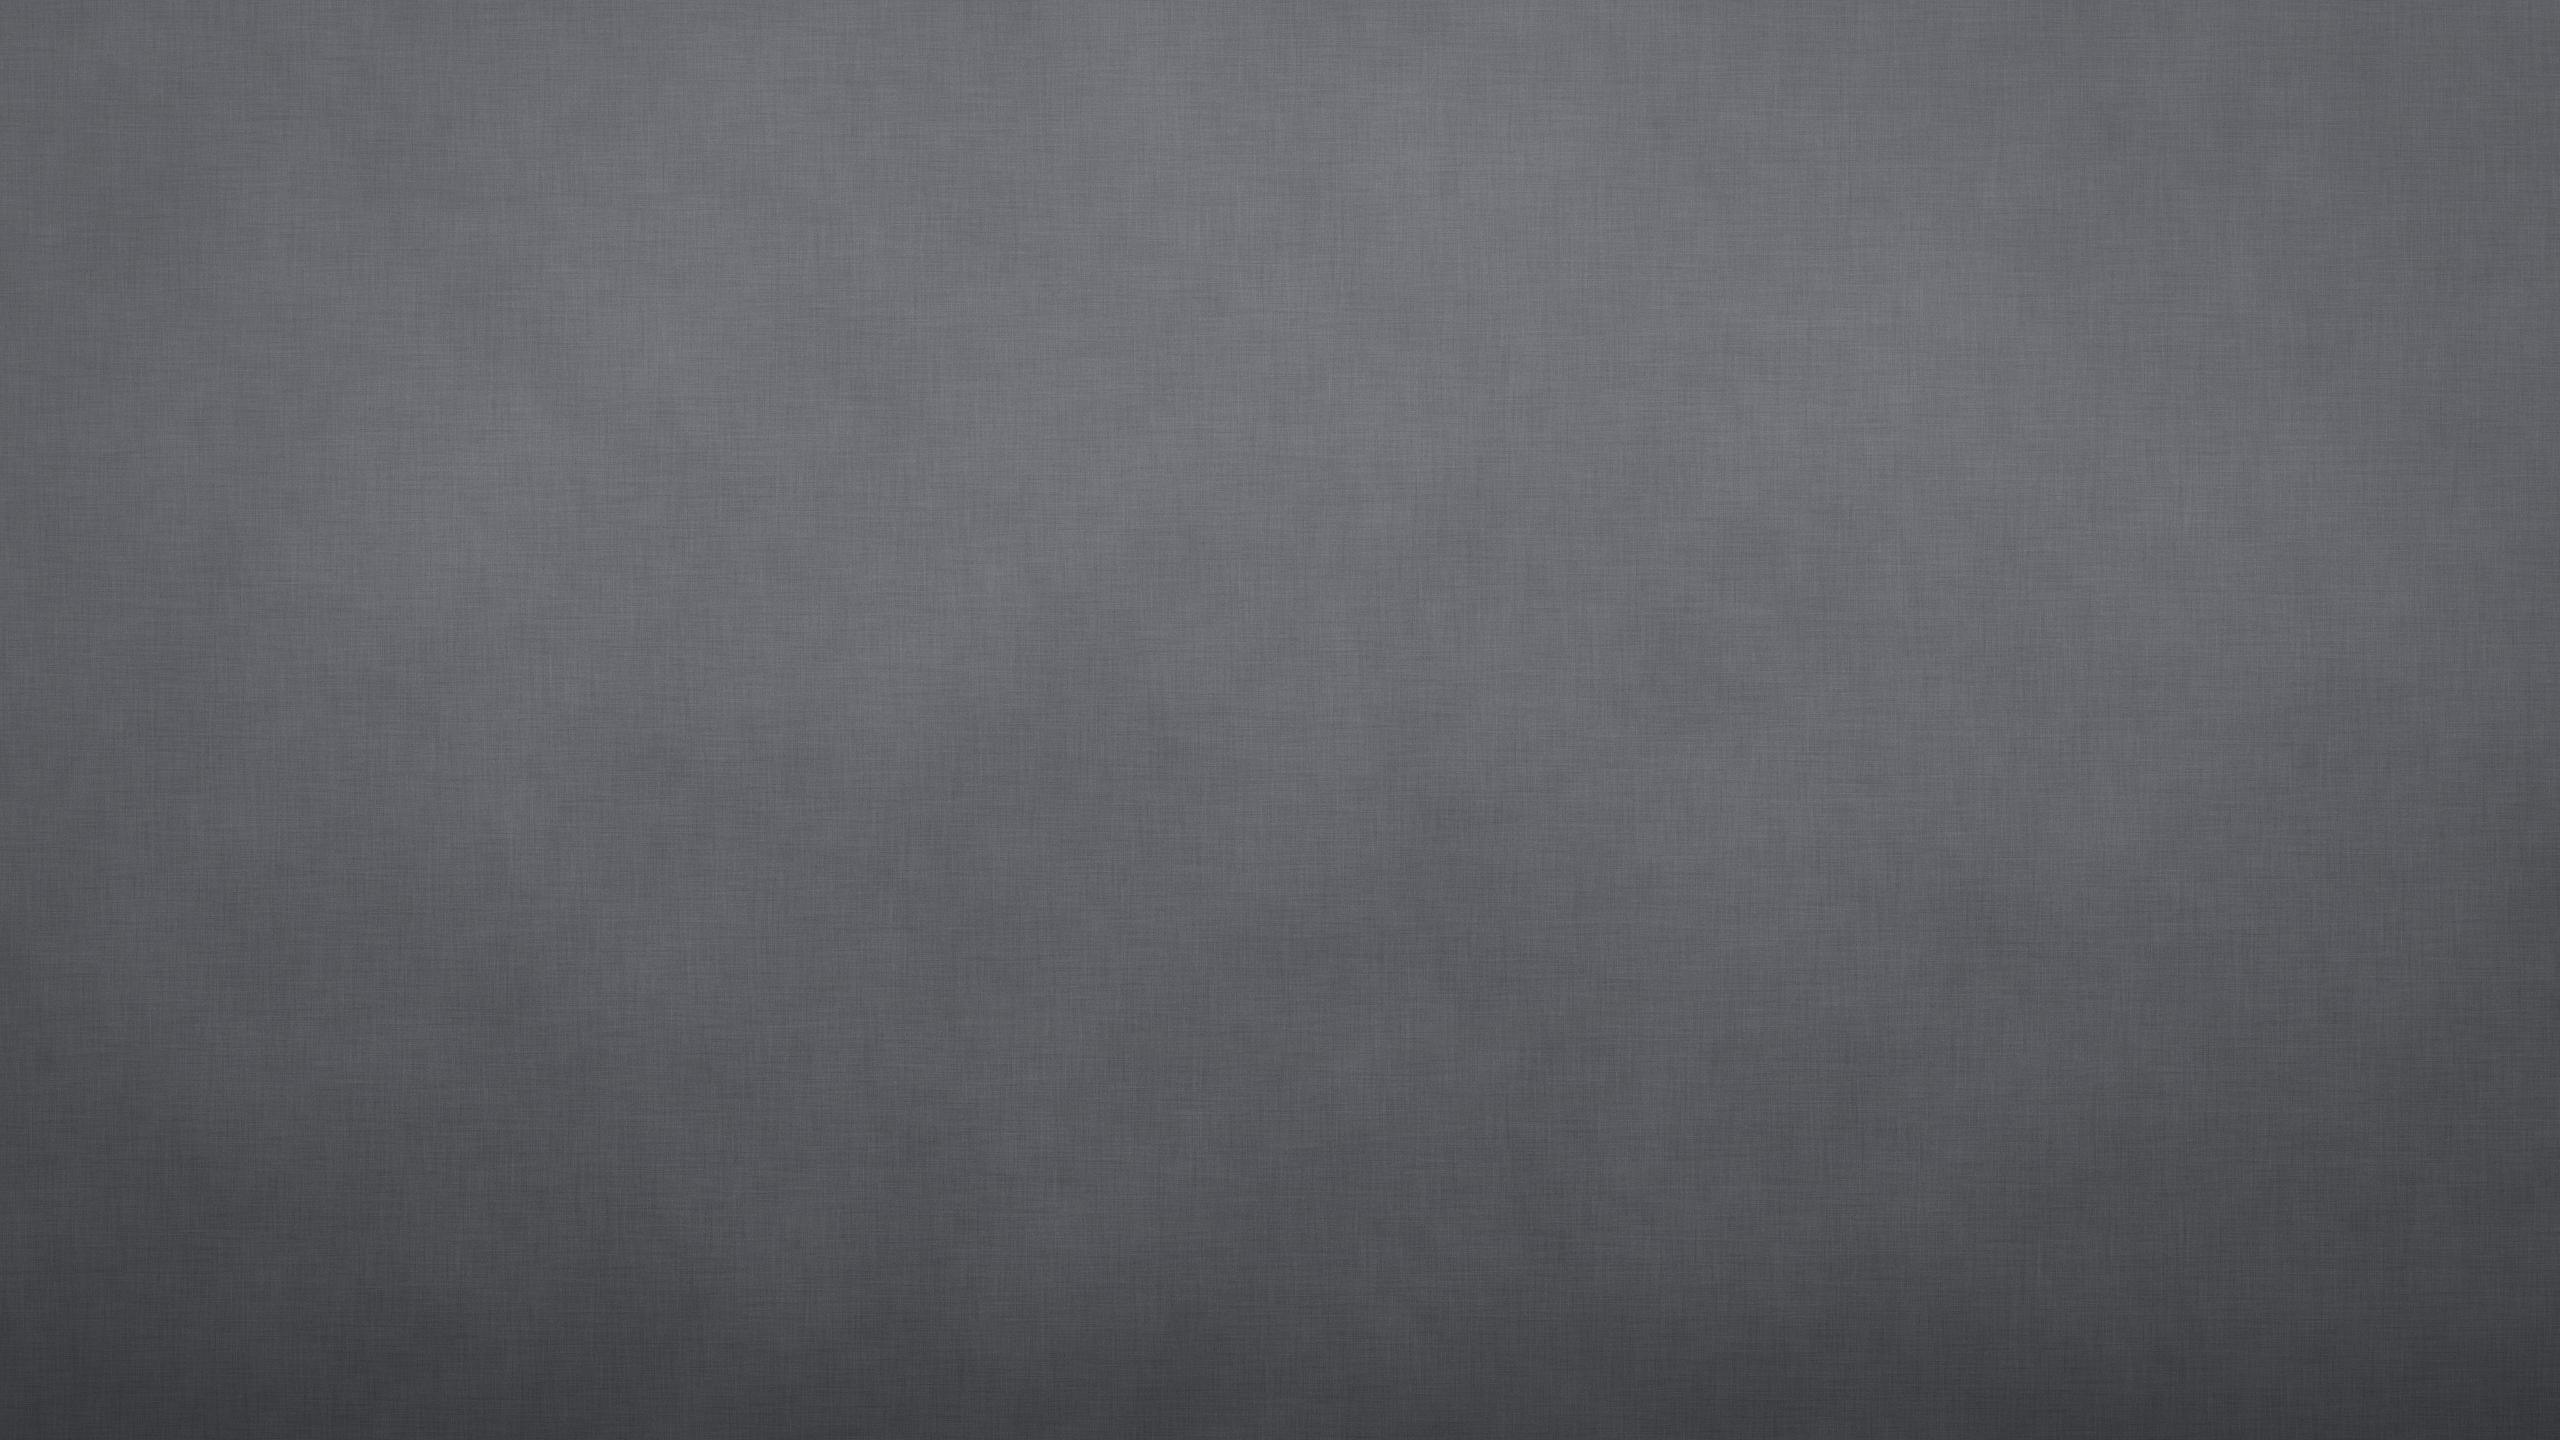 mac os x mavericks wallpaper 2560x1440